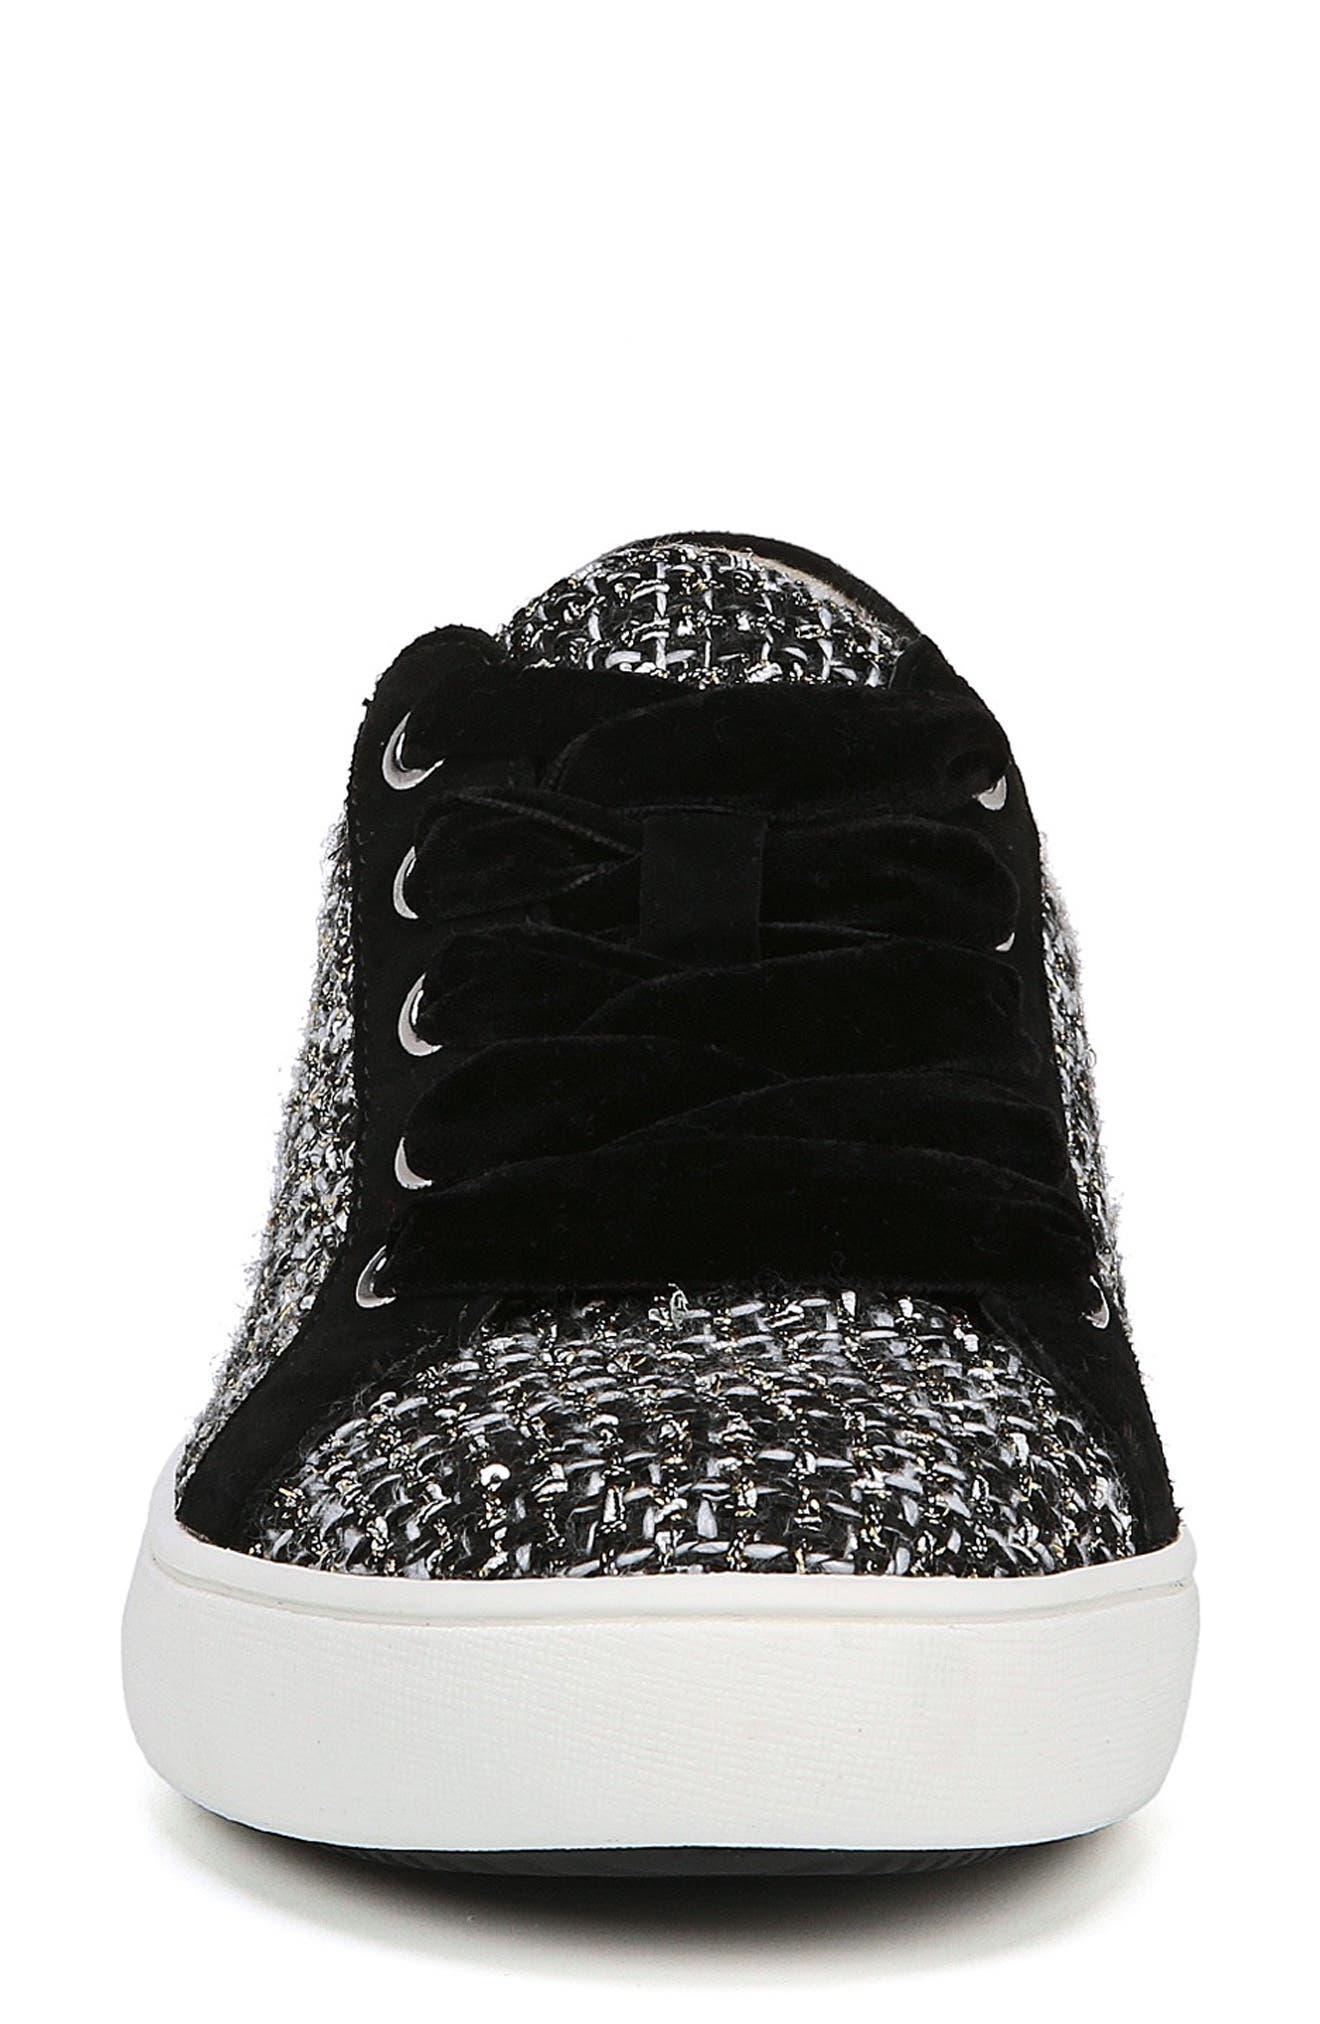 Morrison Sneaker,                             Alternate thumbnail 4, color,                             BLACK/ WHITE TWEED FABRIC